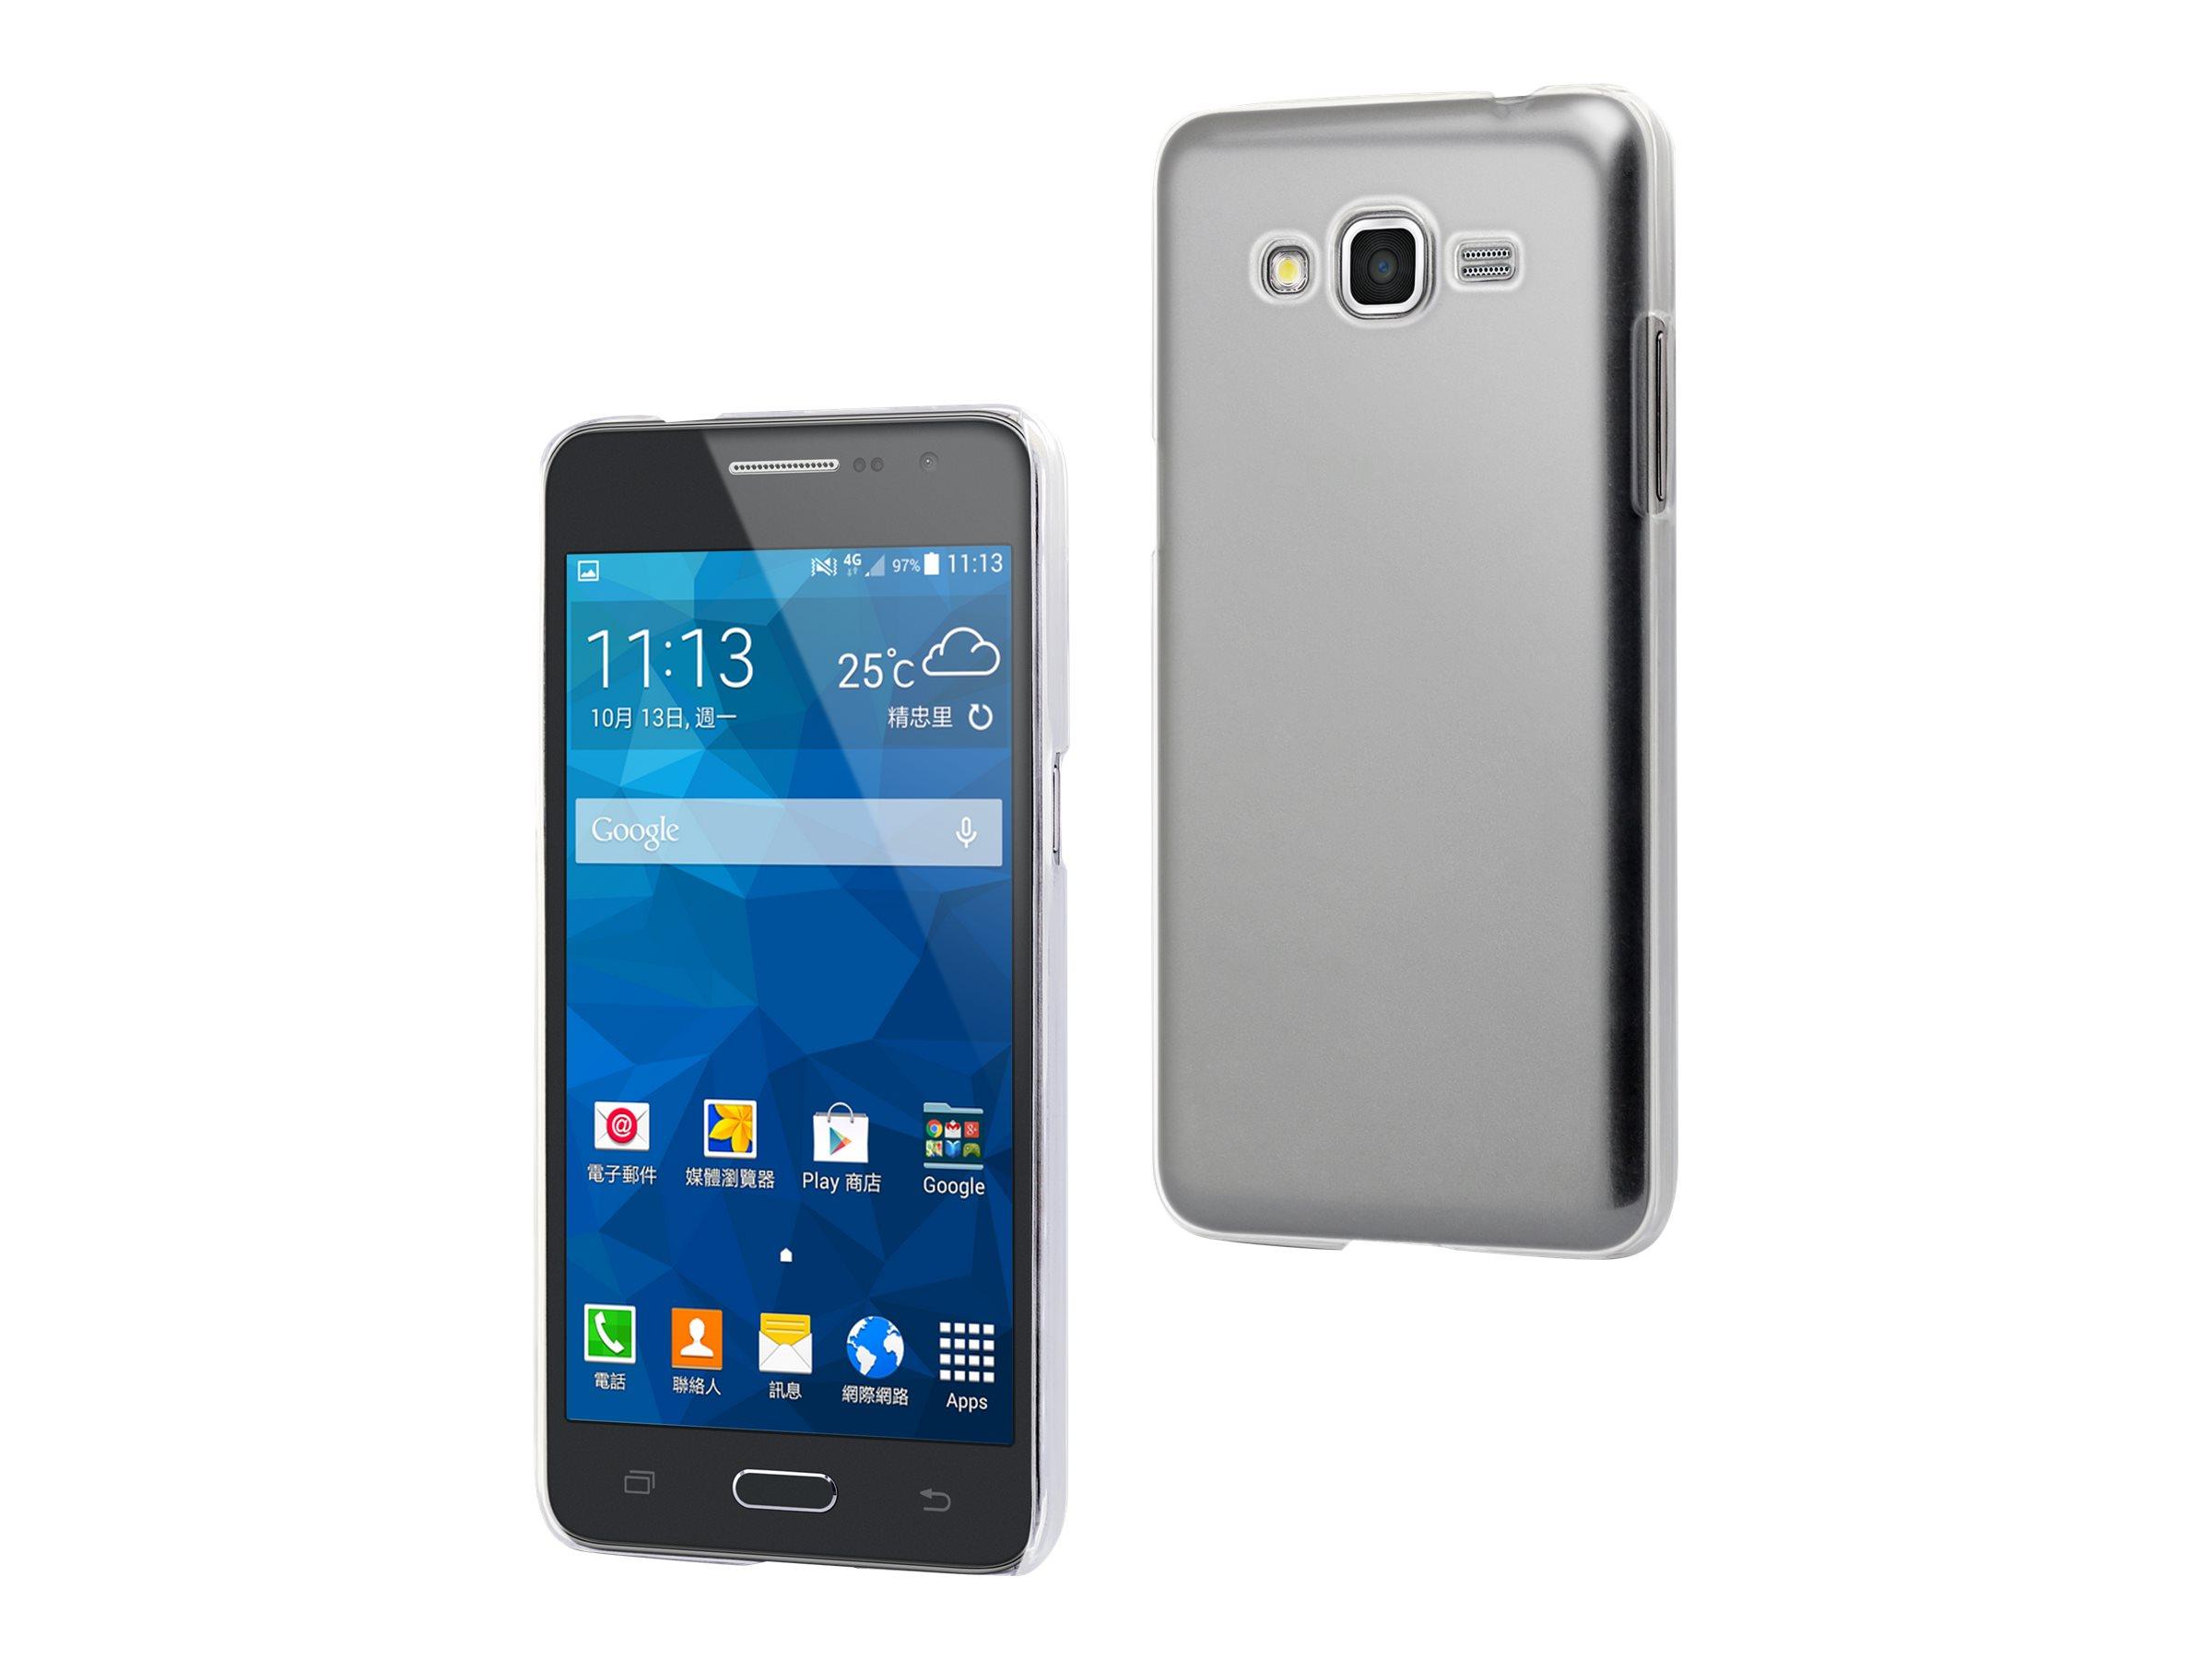 Muvit Clear Case - Coque de protection pour Samsung GALAXY Grand Prime - clair